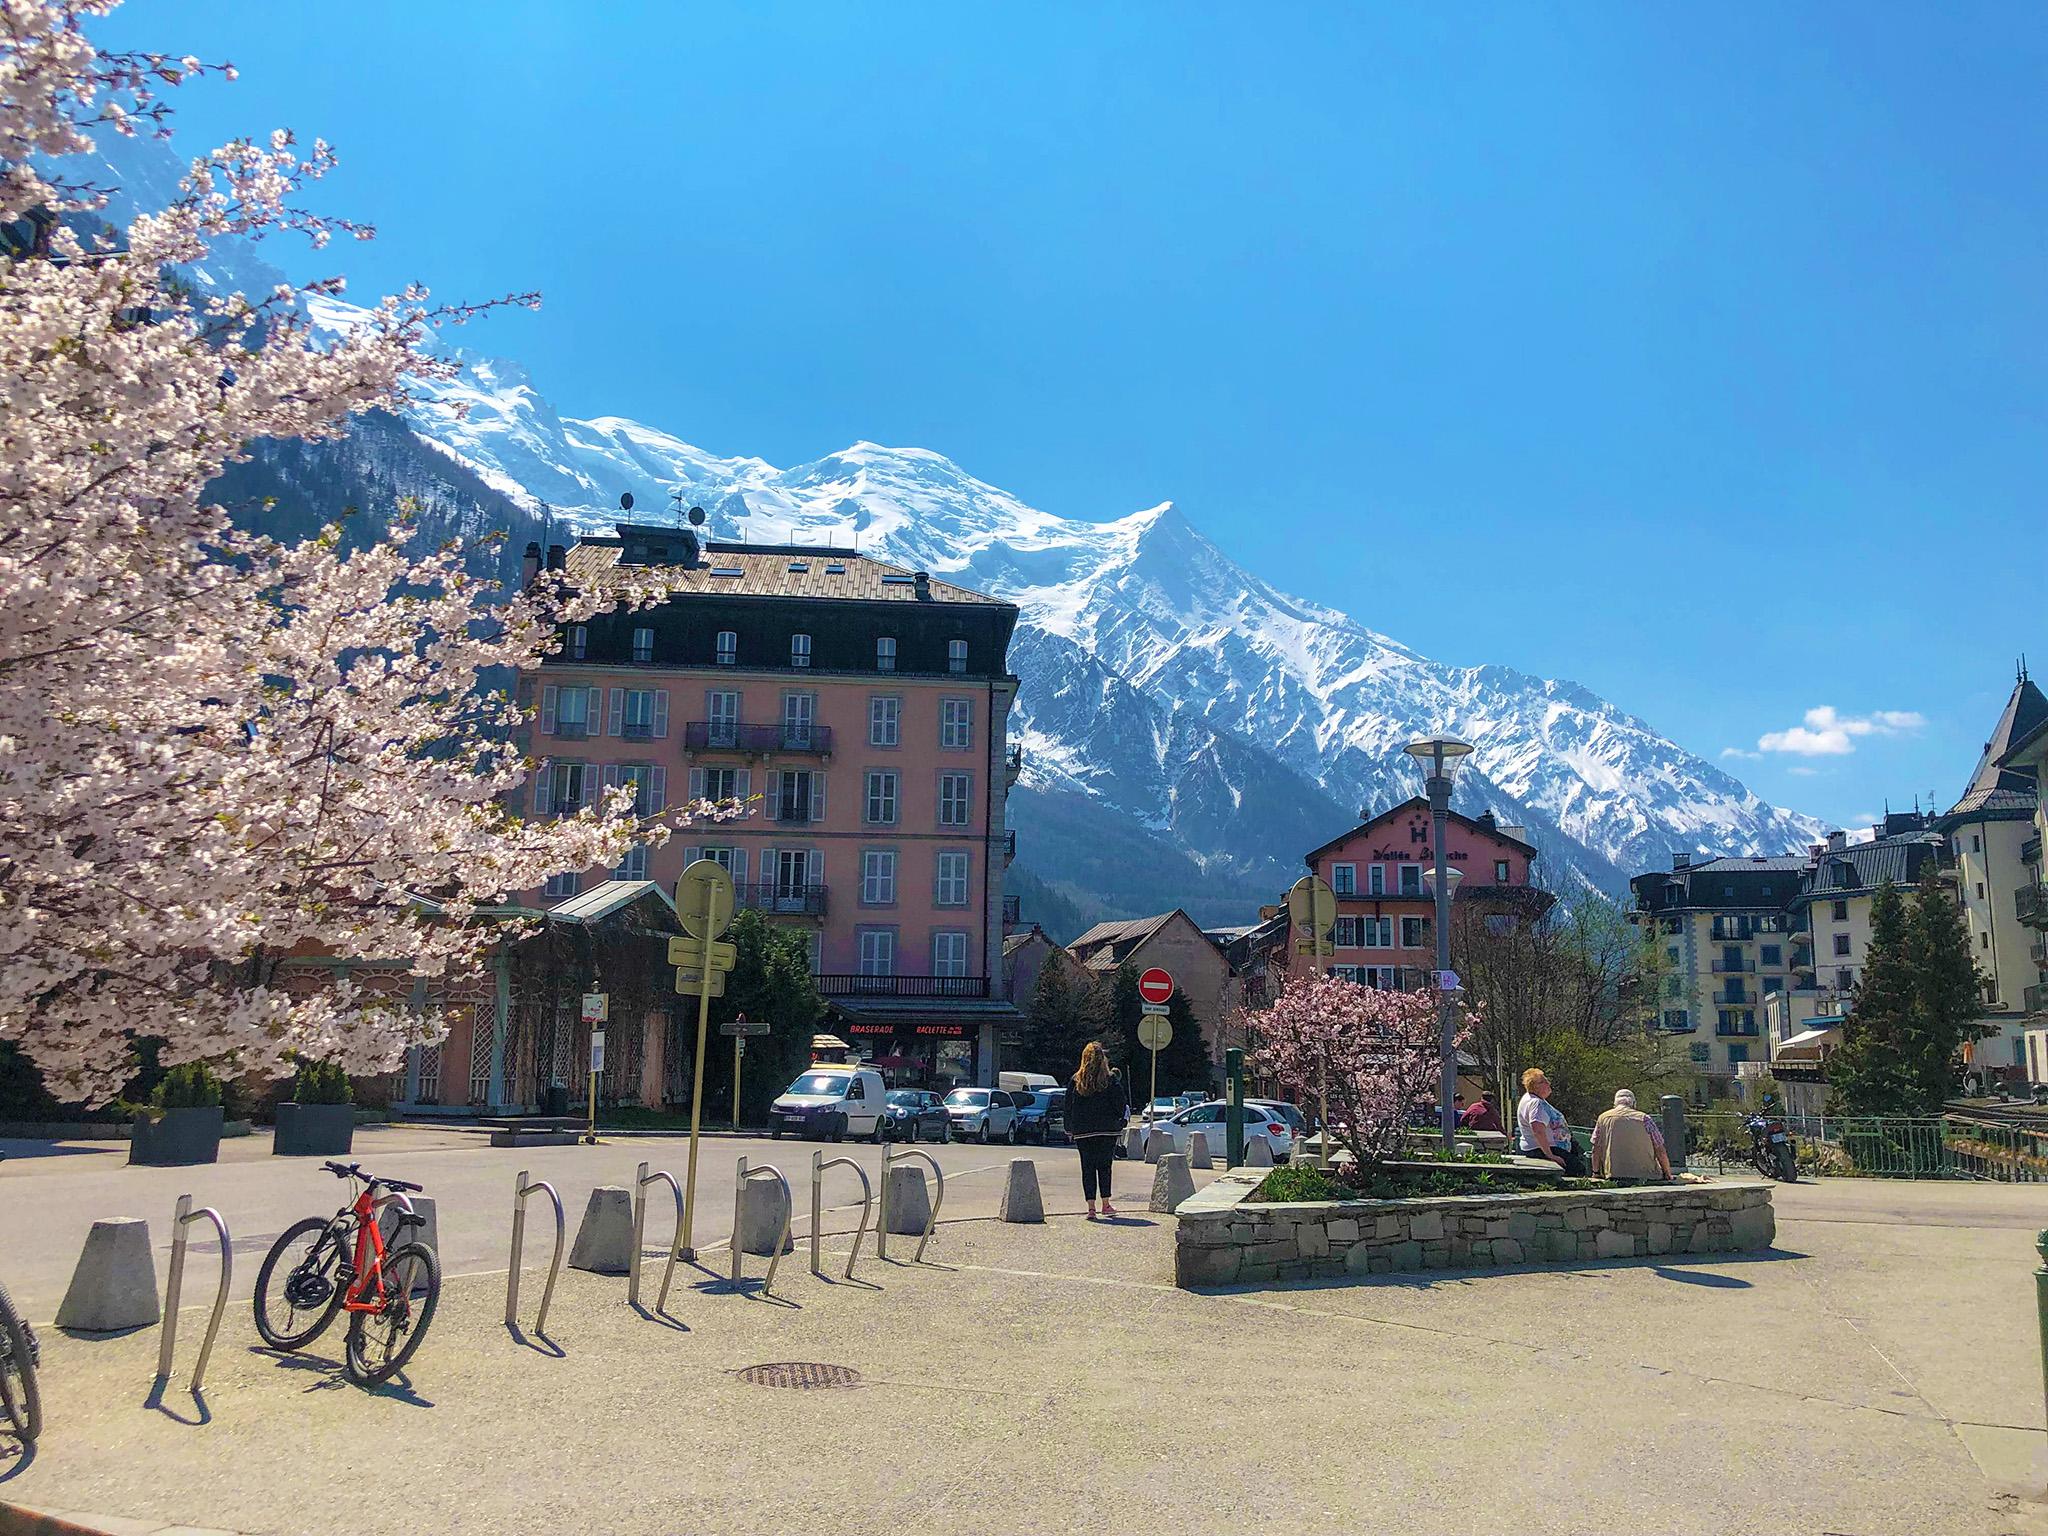 kt_2020_100_keytours_excursions_swisstours_chamonix_mont-blanc_village6_2048_10